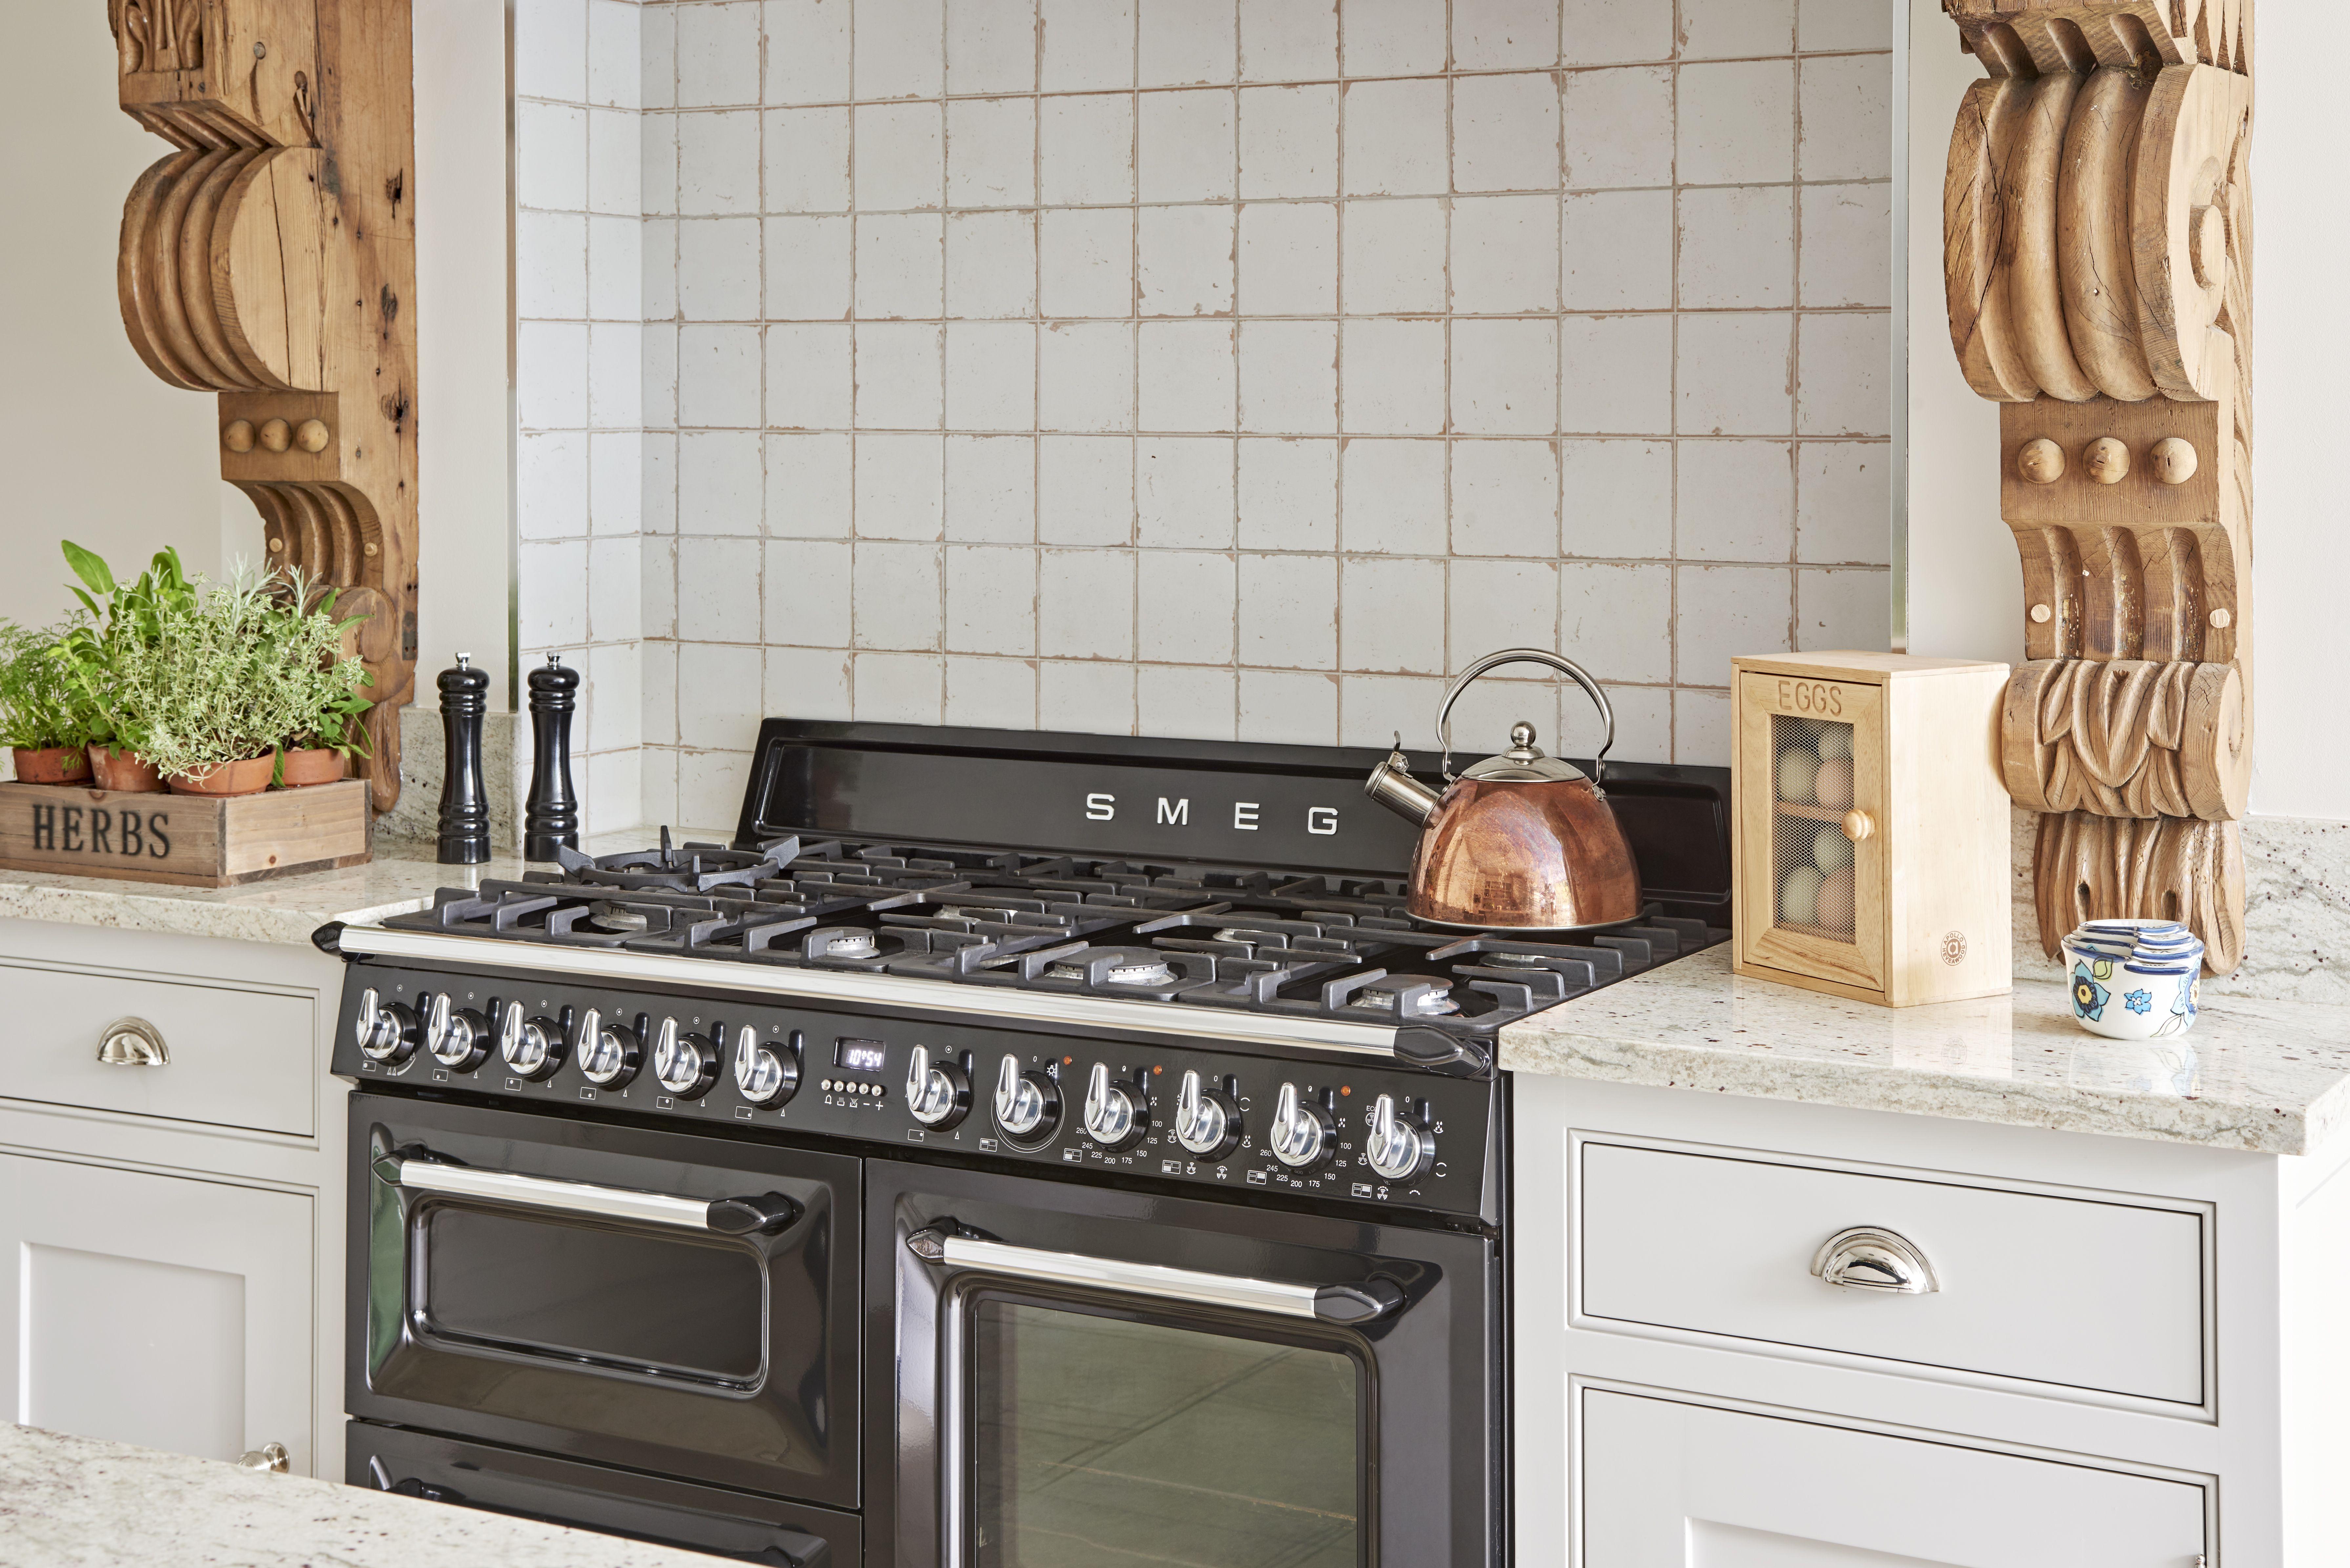 tr4110 range cooker kitchen appliances smeg appliances on kitchen appliances id=22809